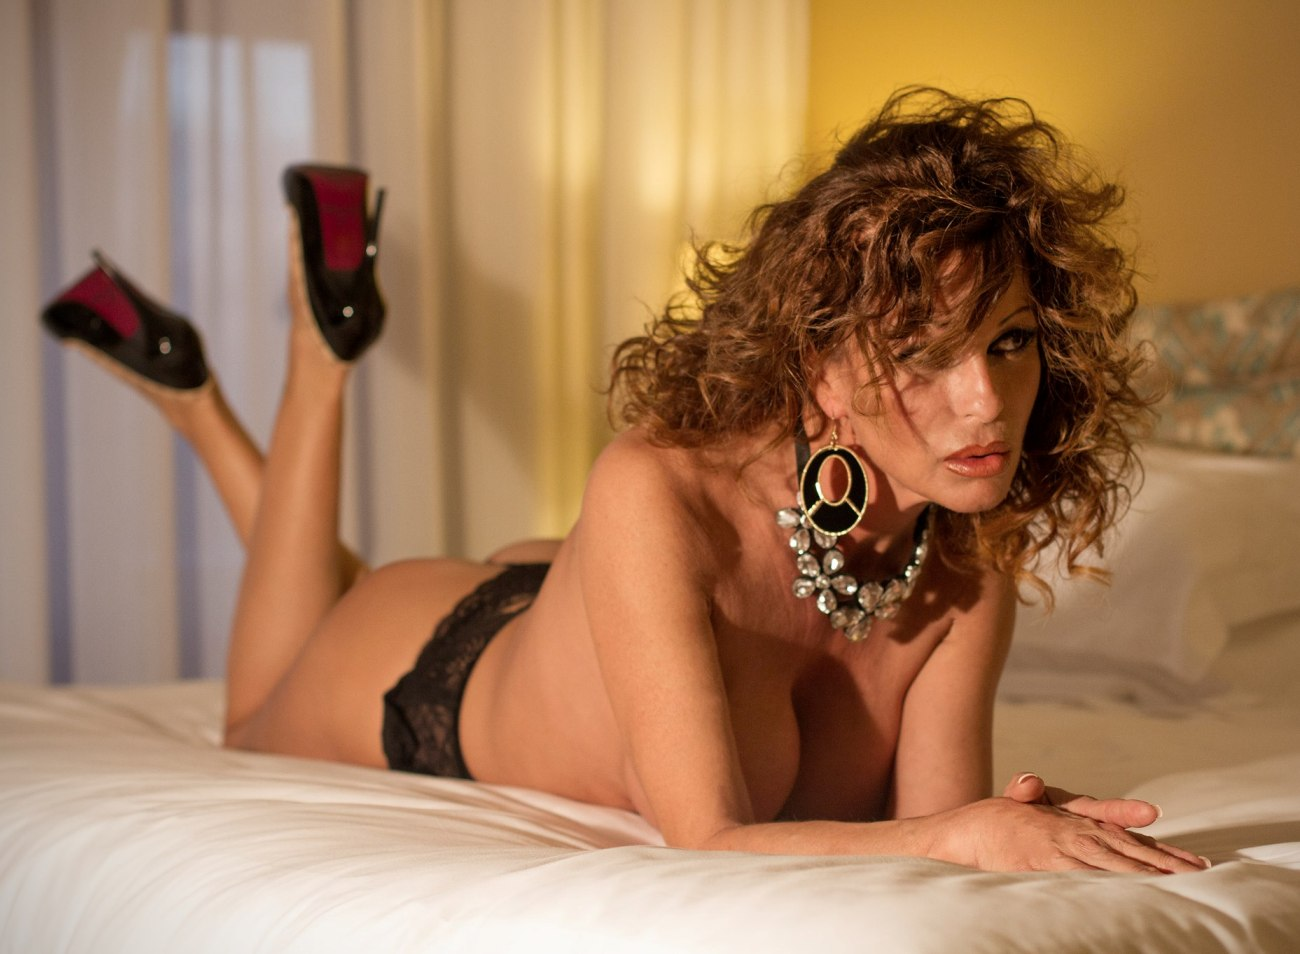 Telefono erotico Luana Borgia